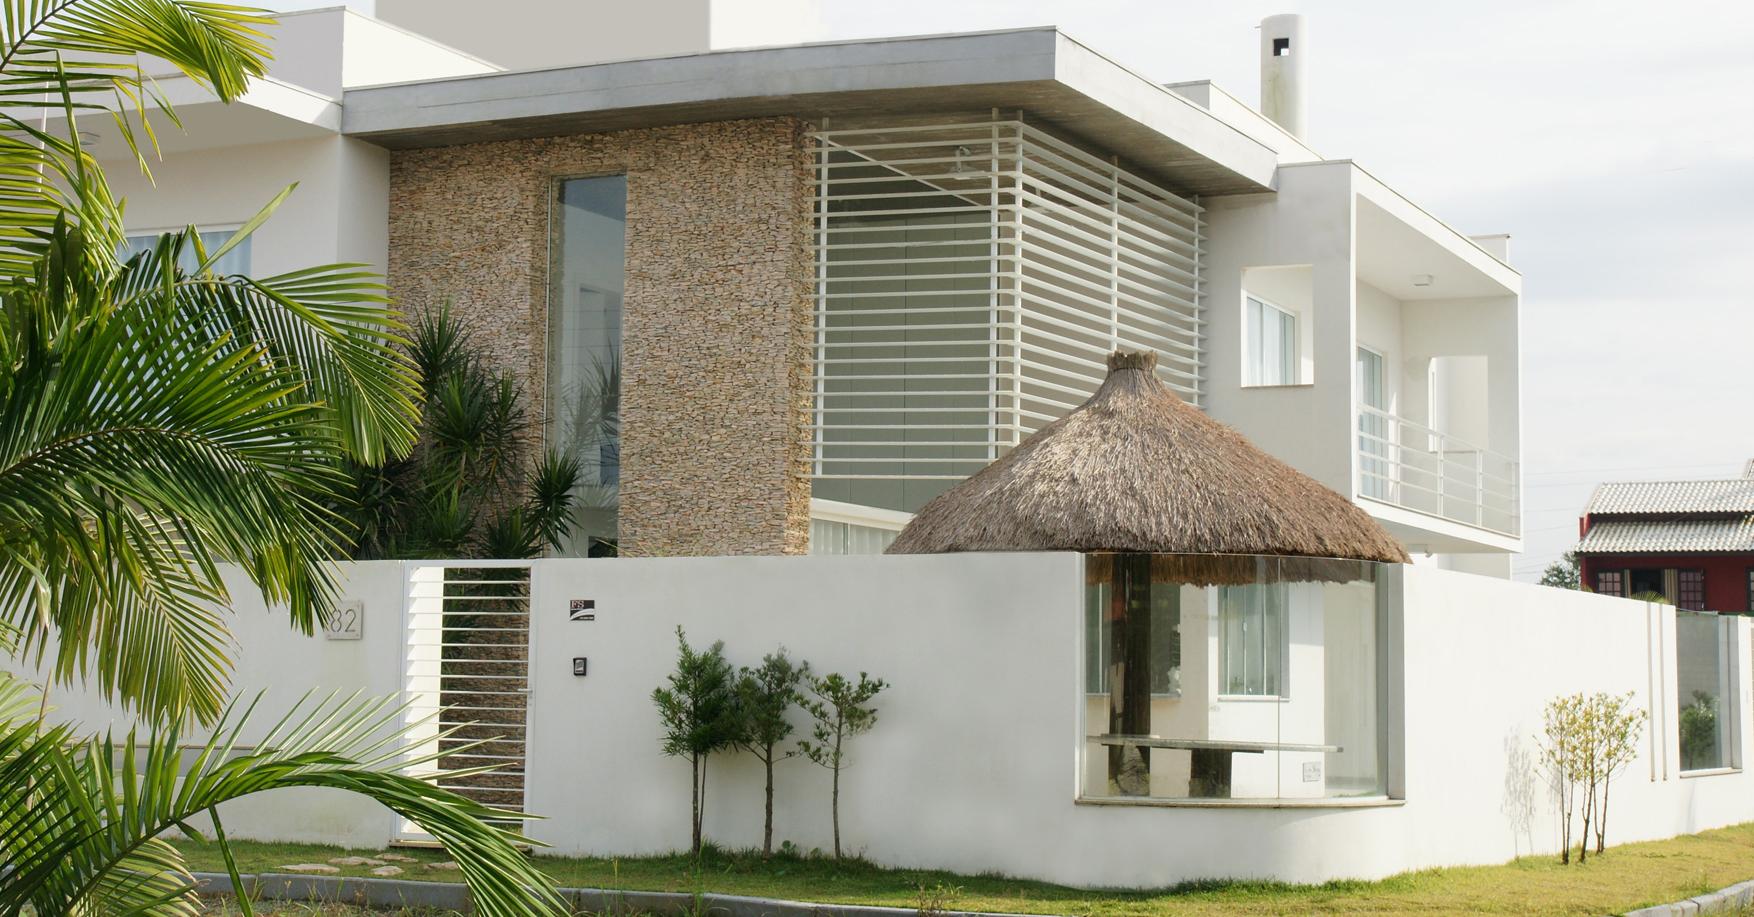 PJV - Casa Brise